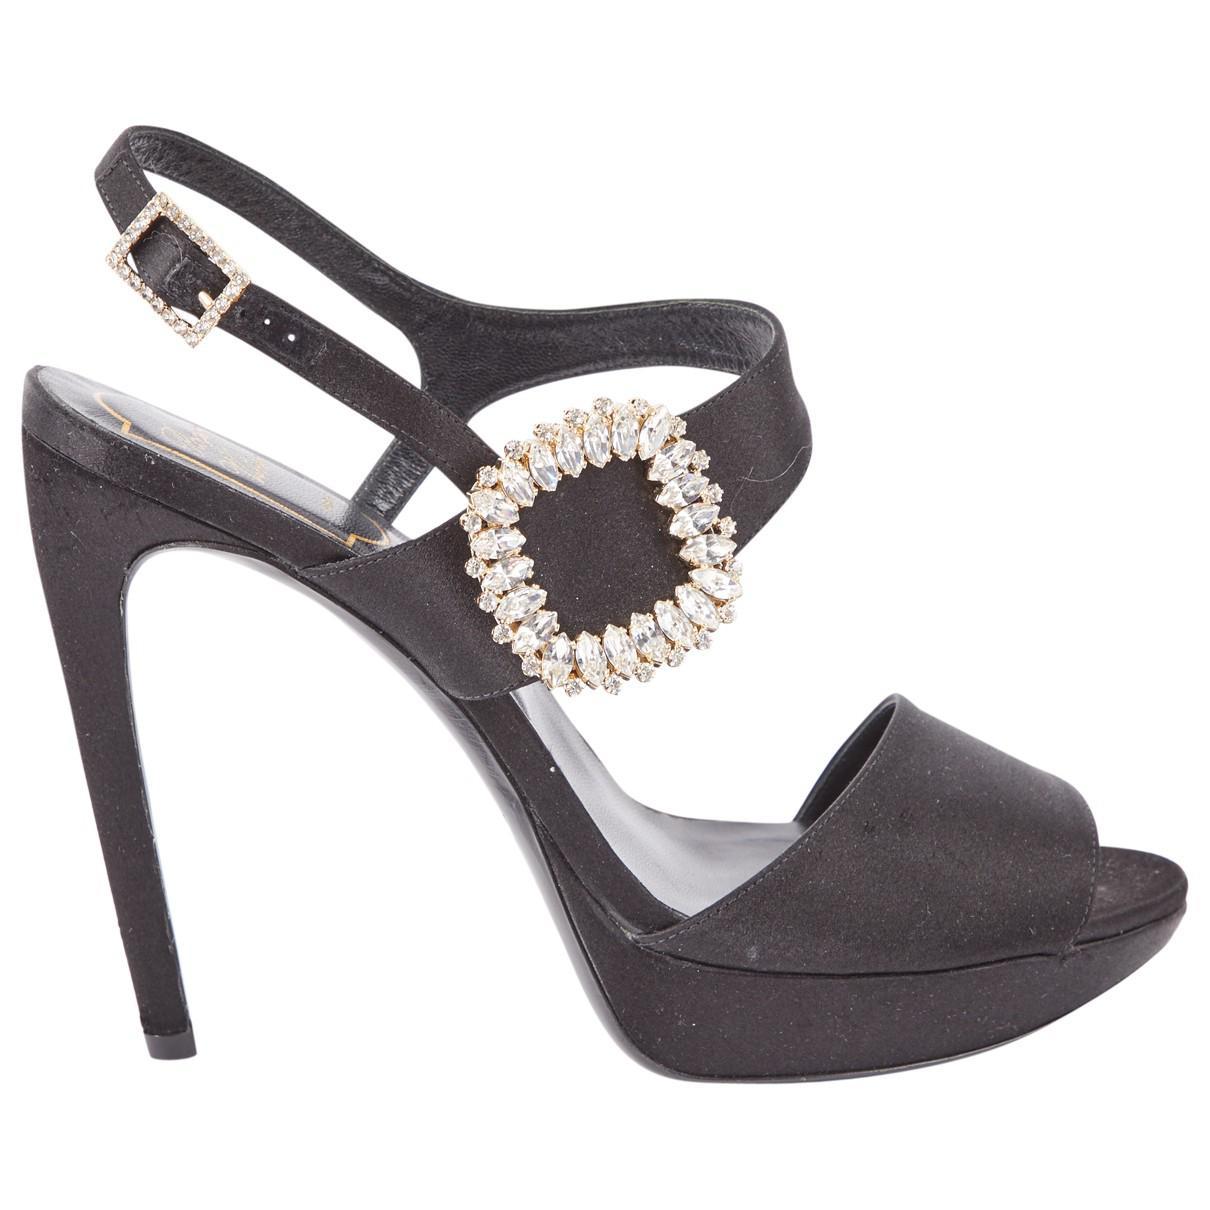 Pre-owned - Cloth sandal Roger Vivier I32xAc8